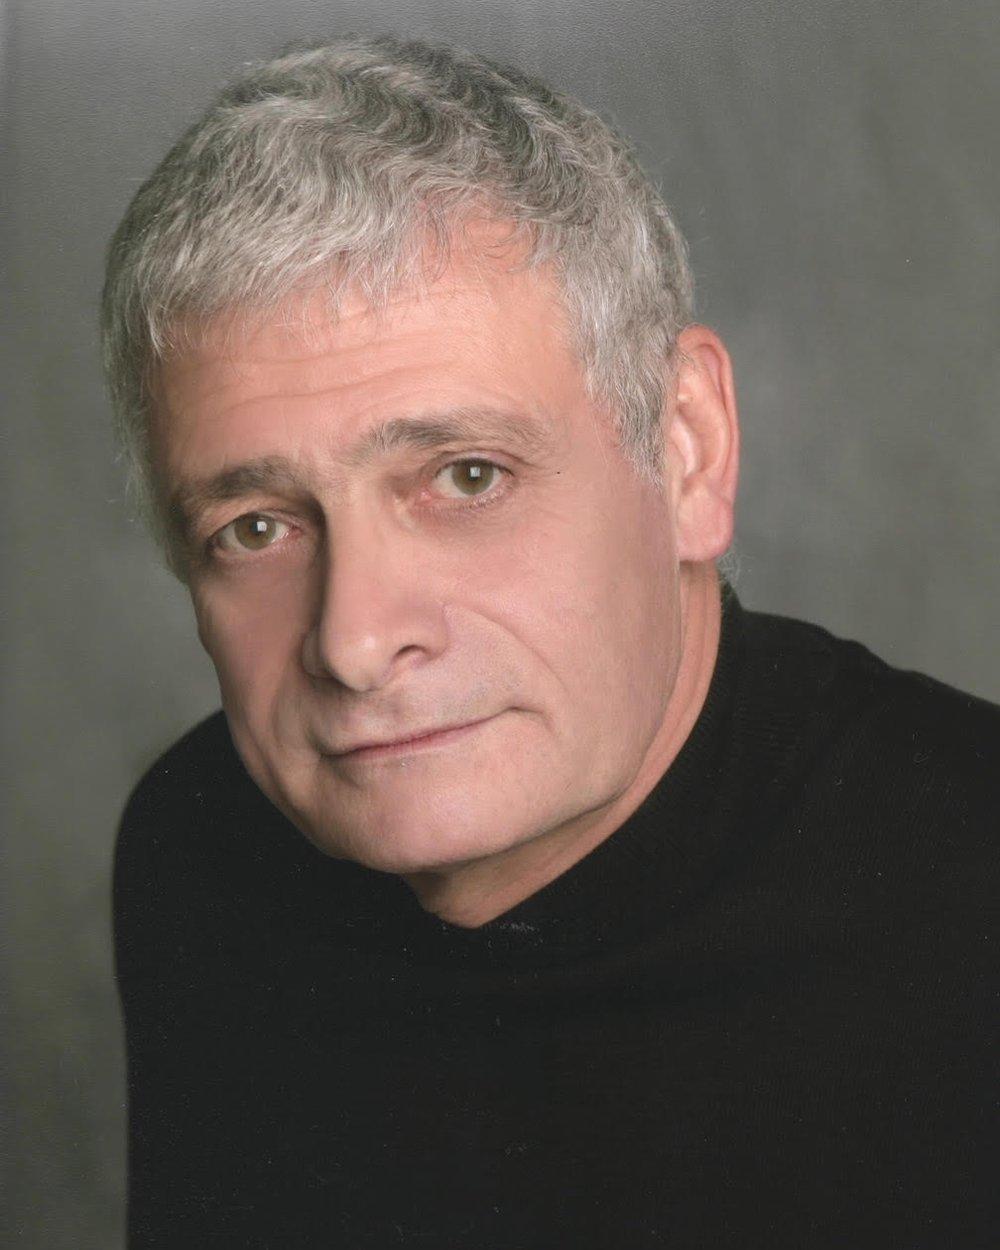 DR. PHIL CUMMINS, skin science consultant and former R&D director of Estée Lauder